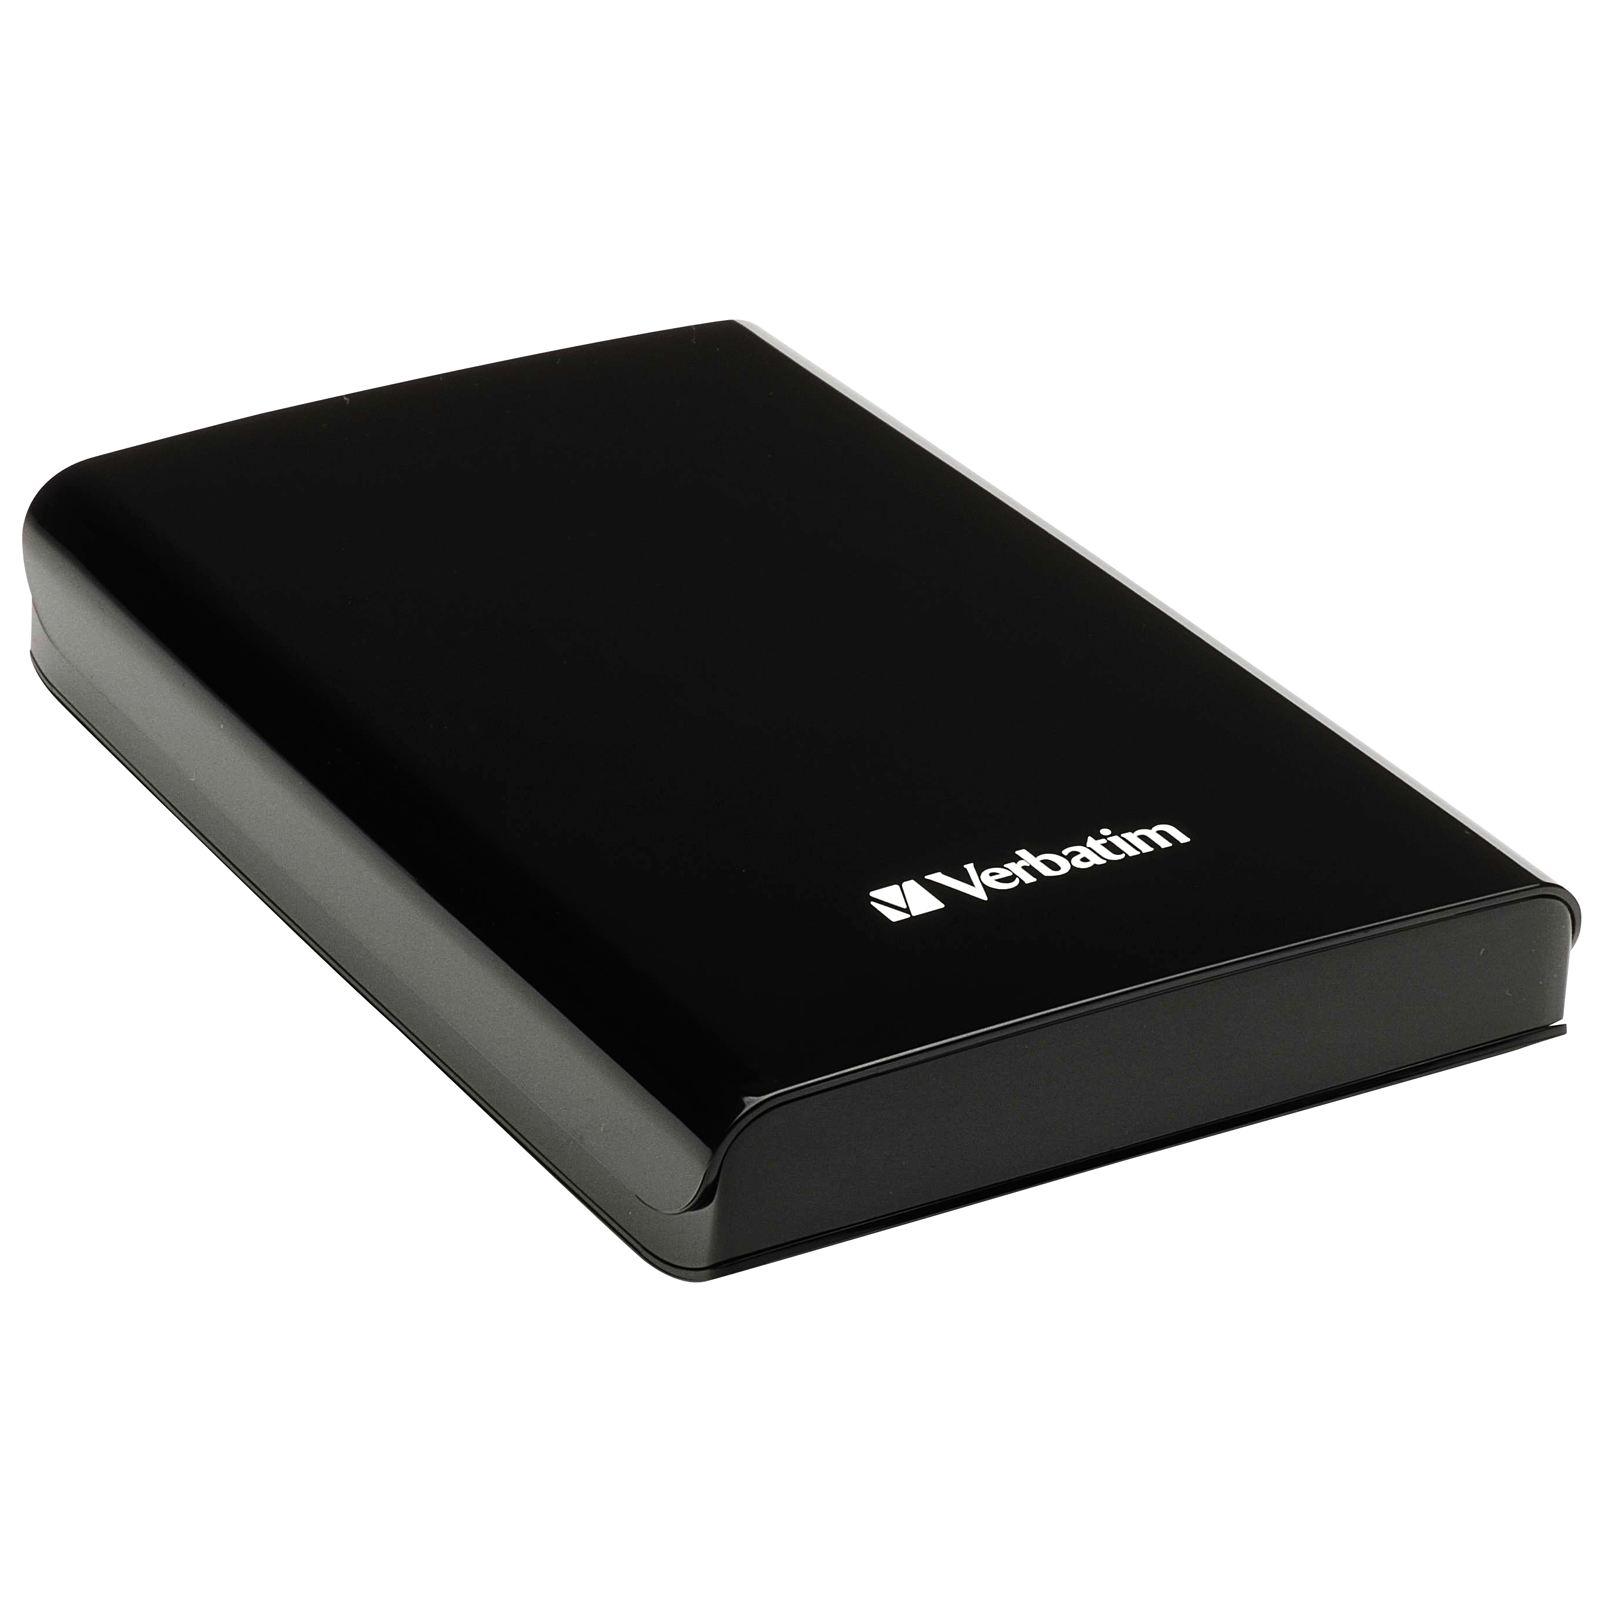 Verbatim 500GB 2.5' USB3.0 Black Retail, Backup Software, 2 Years Warranty (LS)